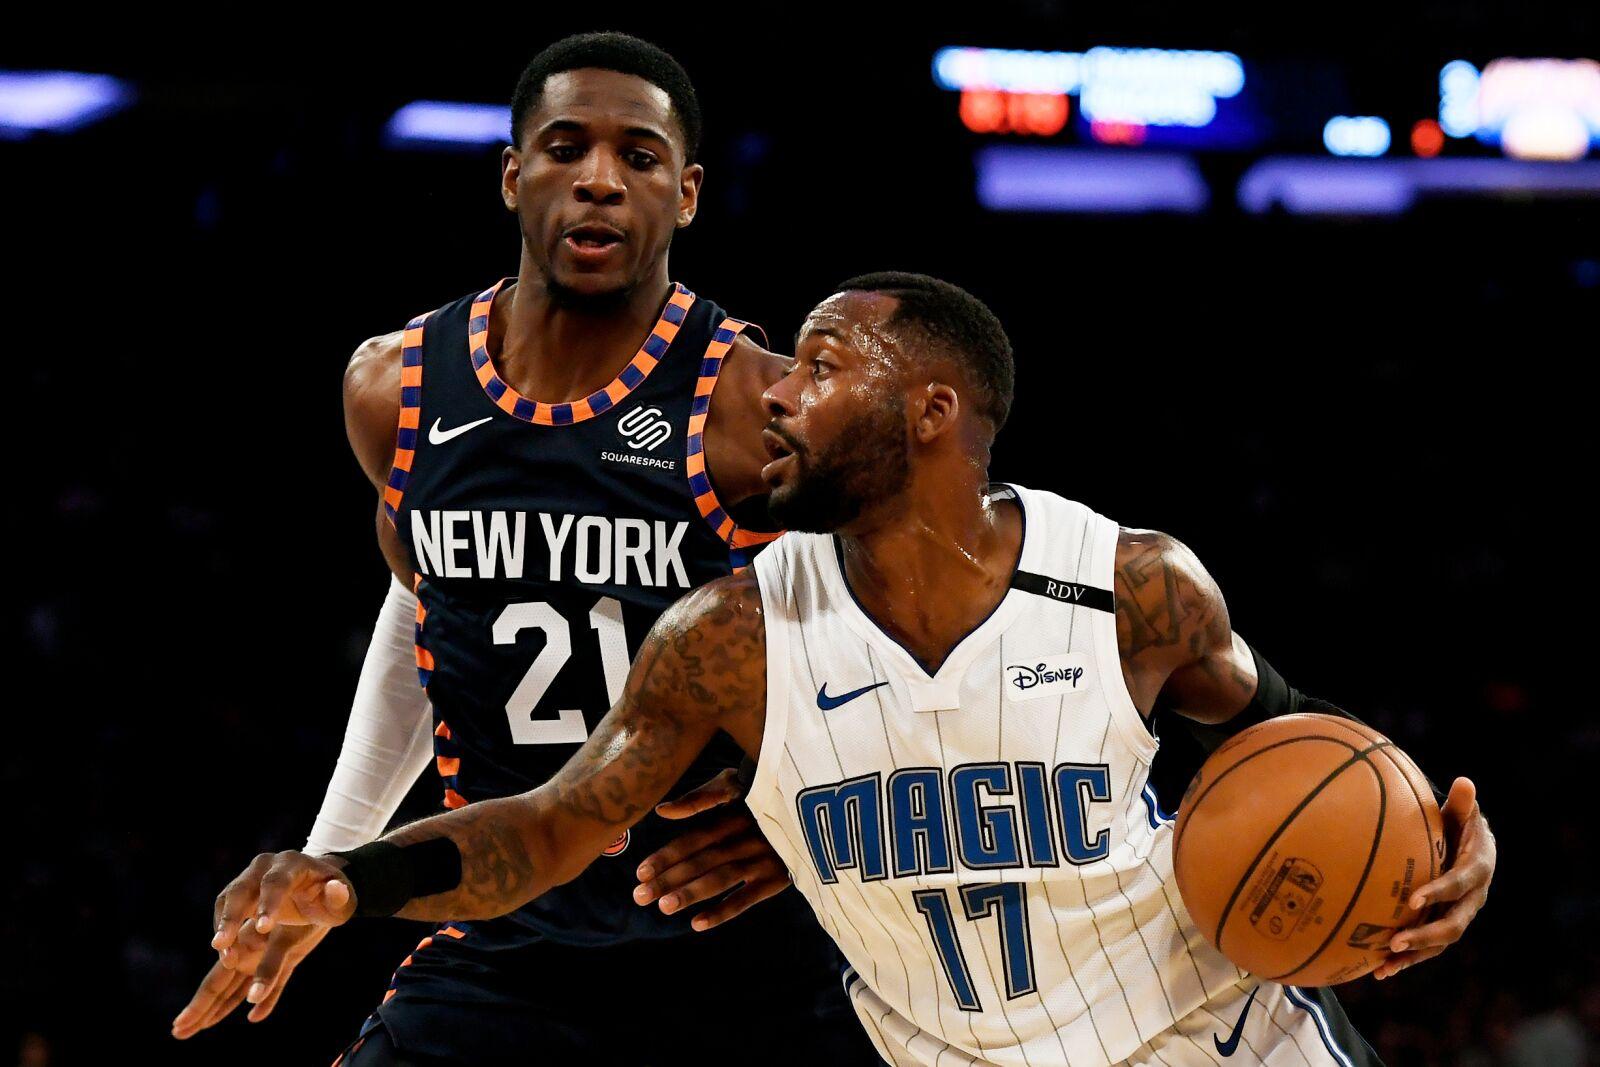 Philadelphia 76ers: Trading Jonathon Simmons has to be a